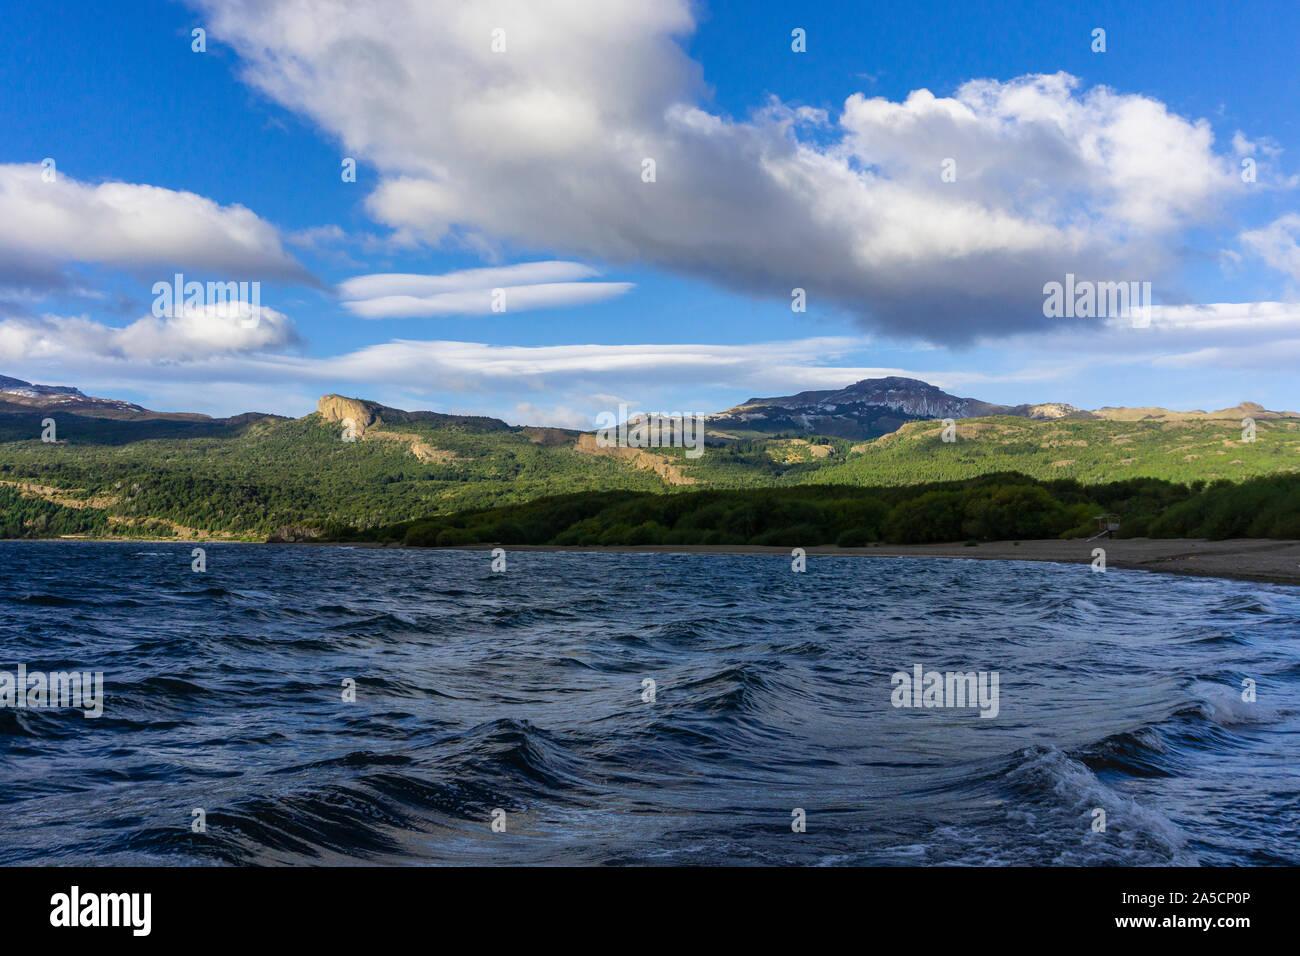 Futalaufquen lake shore on a windy day, Los Alerces National Park, Patagonia, Argentina Stock Photo